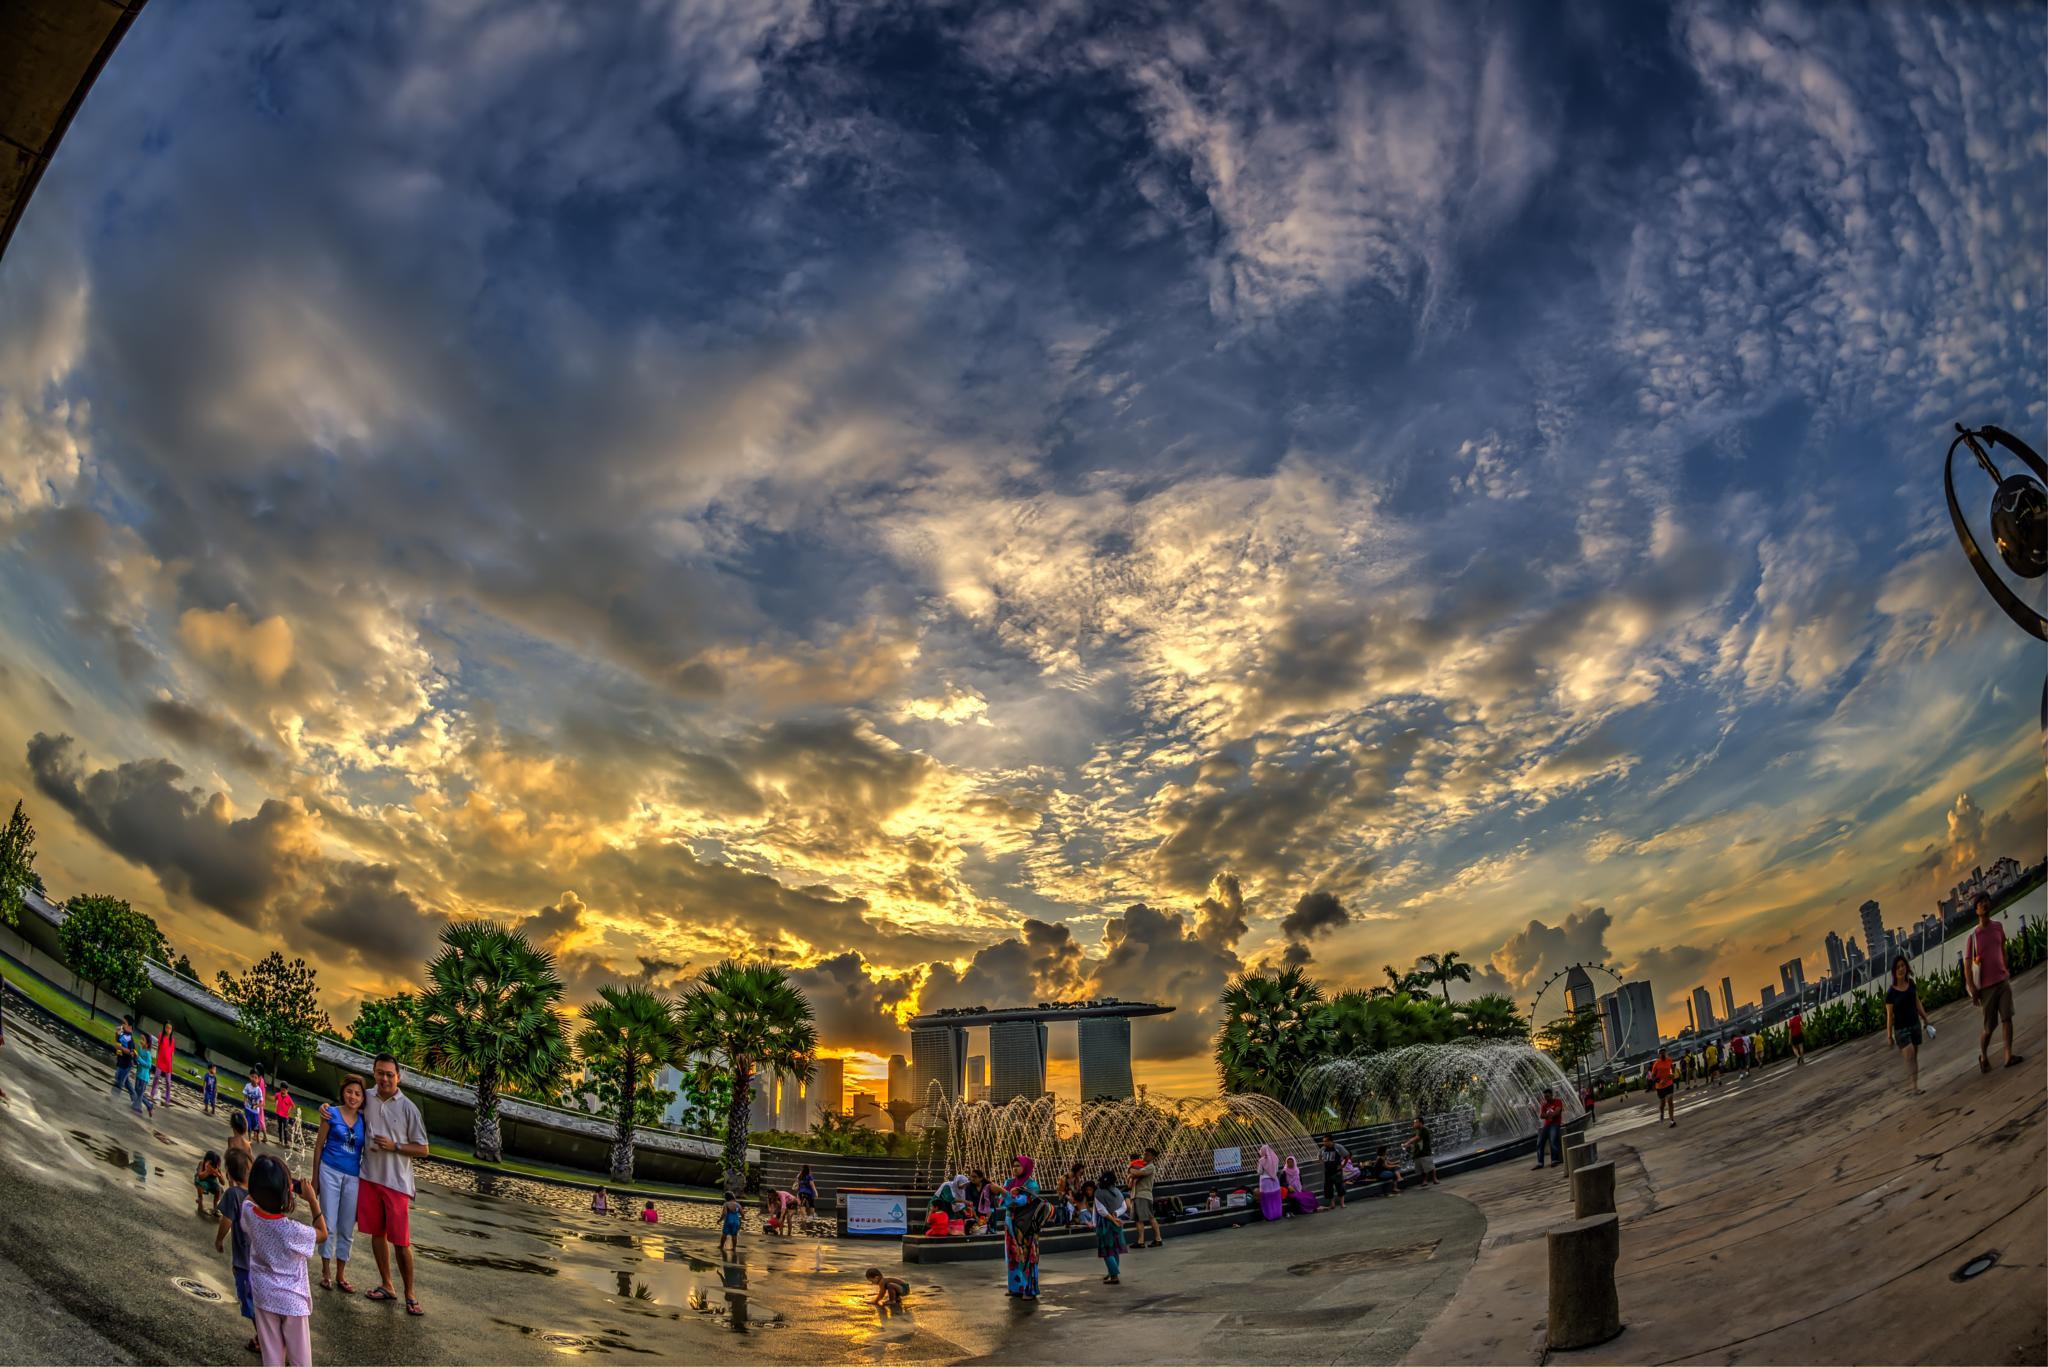 Fisheye View of Marina Bay Esplanade at Sunset, Singapore, Photo 26 by iatu8888